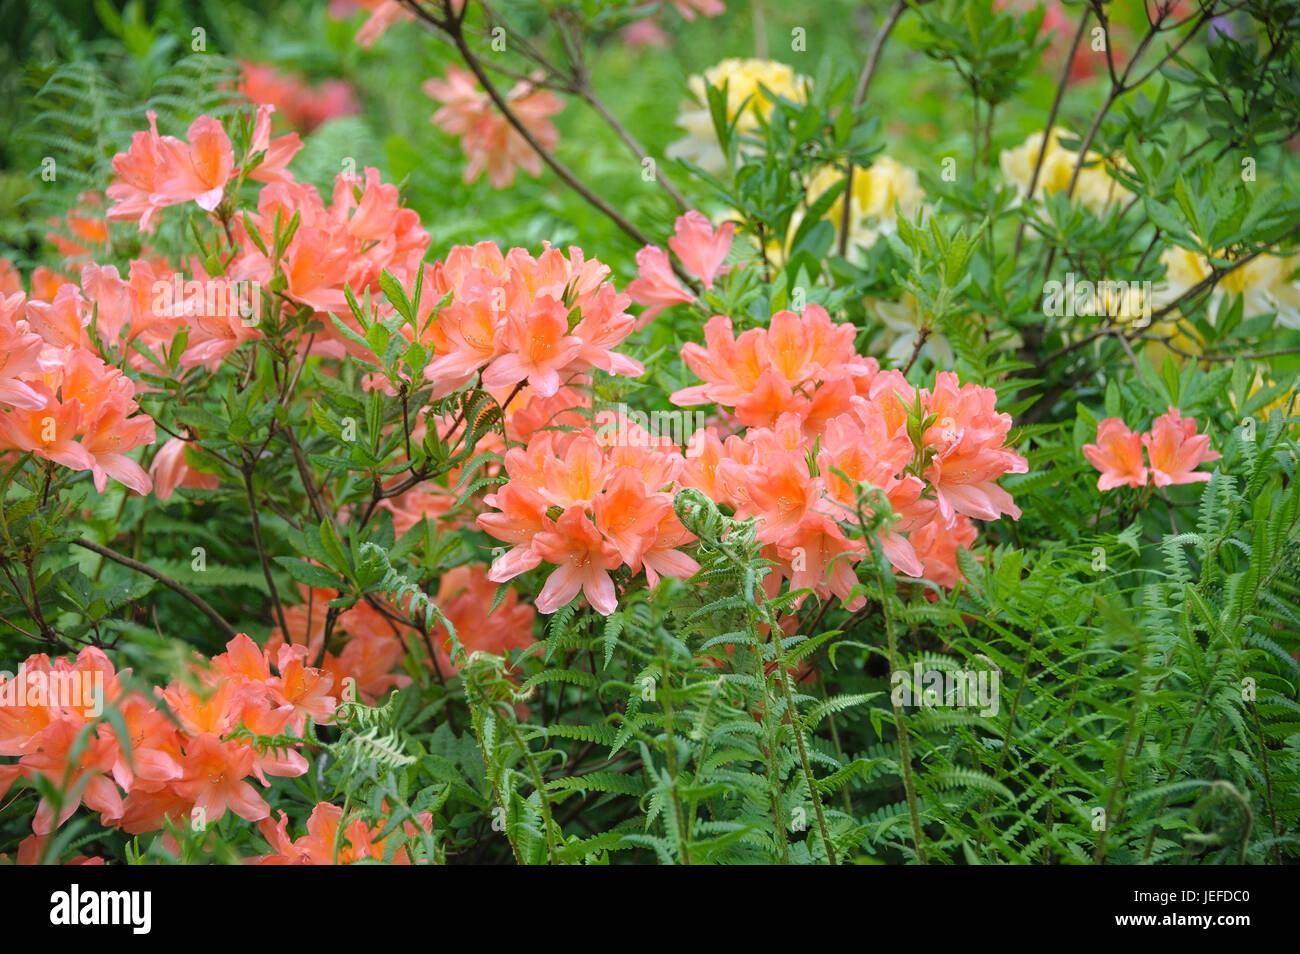 Azalea, rhododendron mollis x sinensis salmon , Azalee (Rhododendron mollis x sinensis lachs) - Stock Image